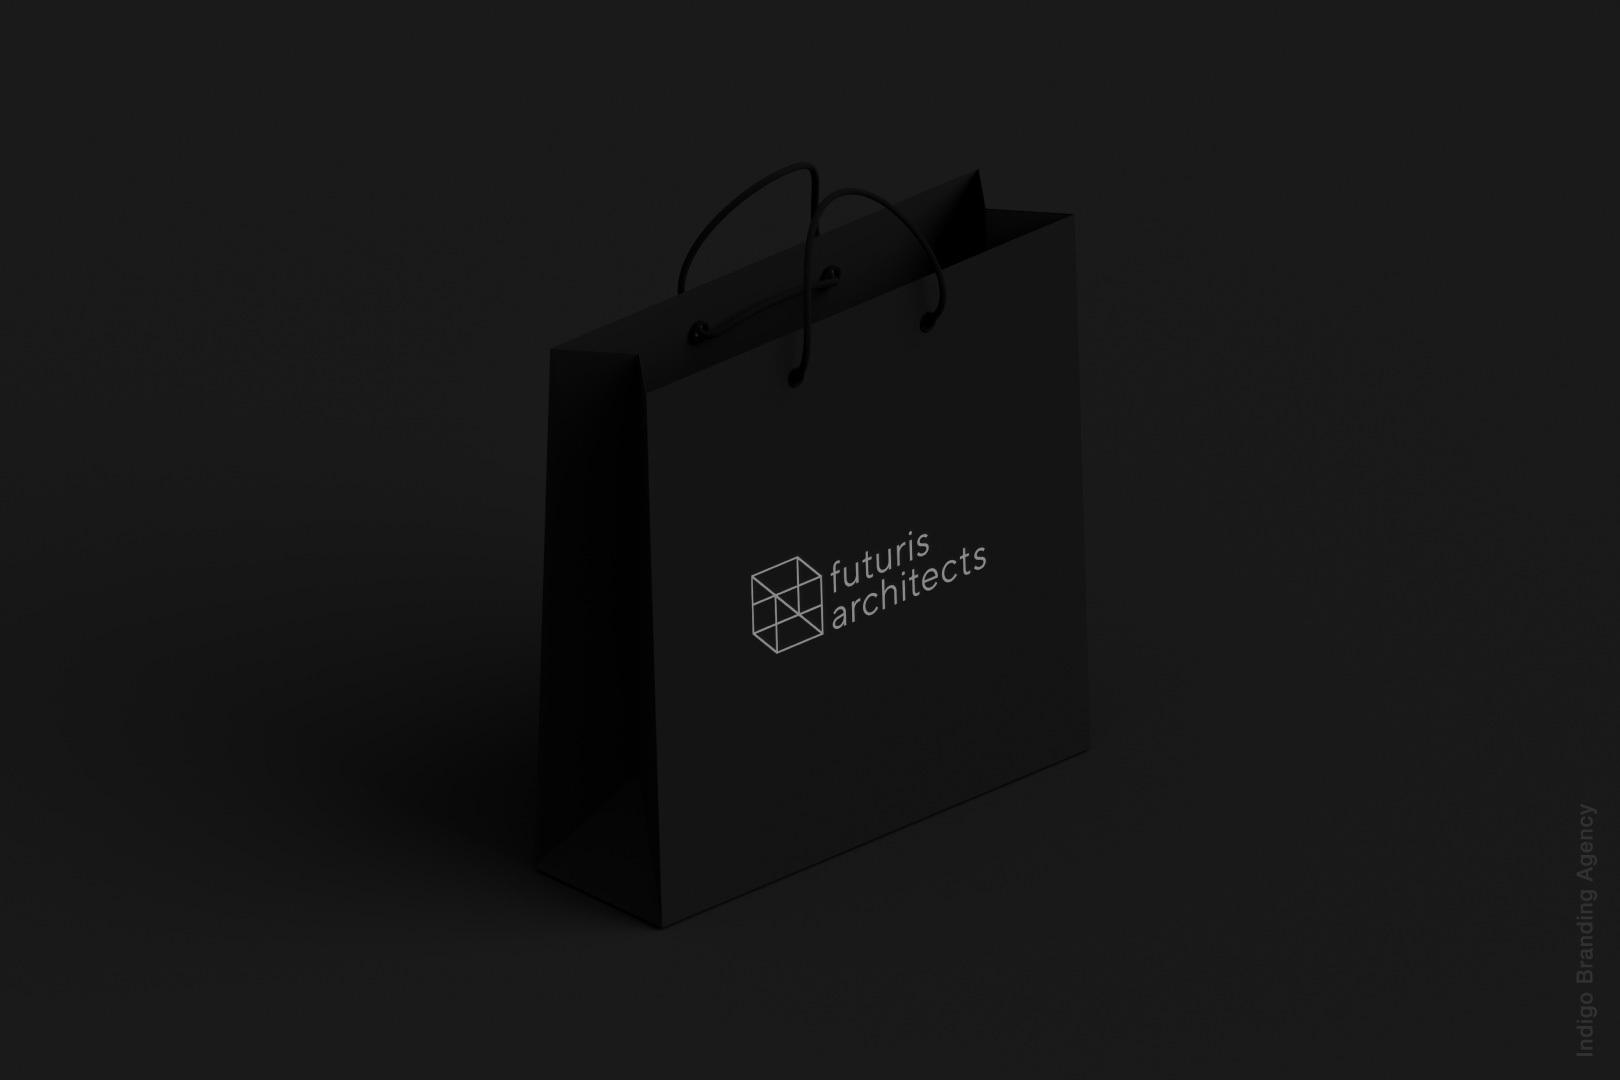 packaging design architectural branding mockup futuris architects interior design bag